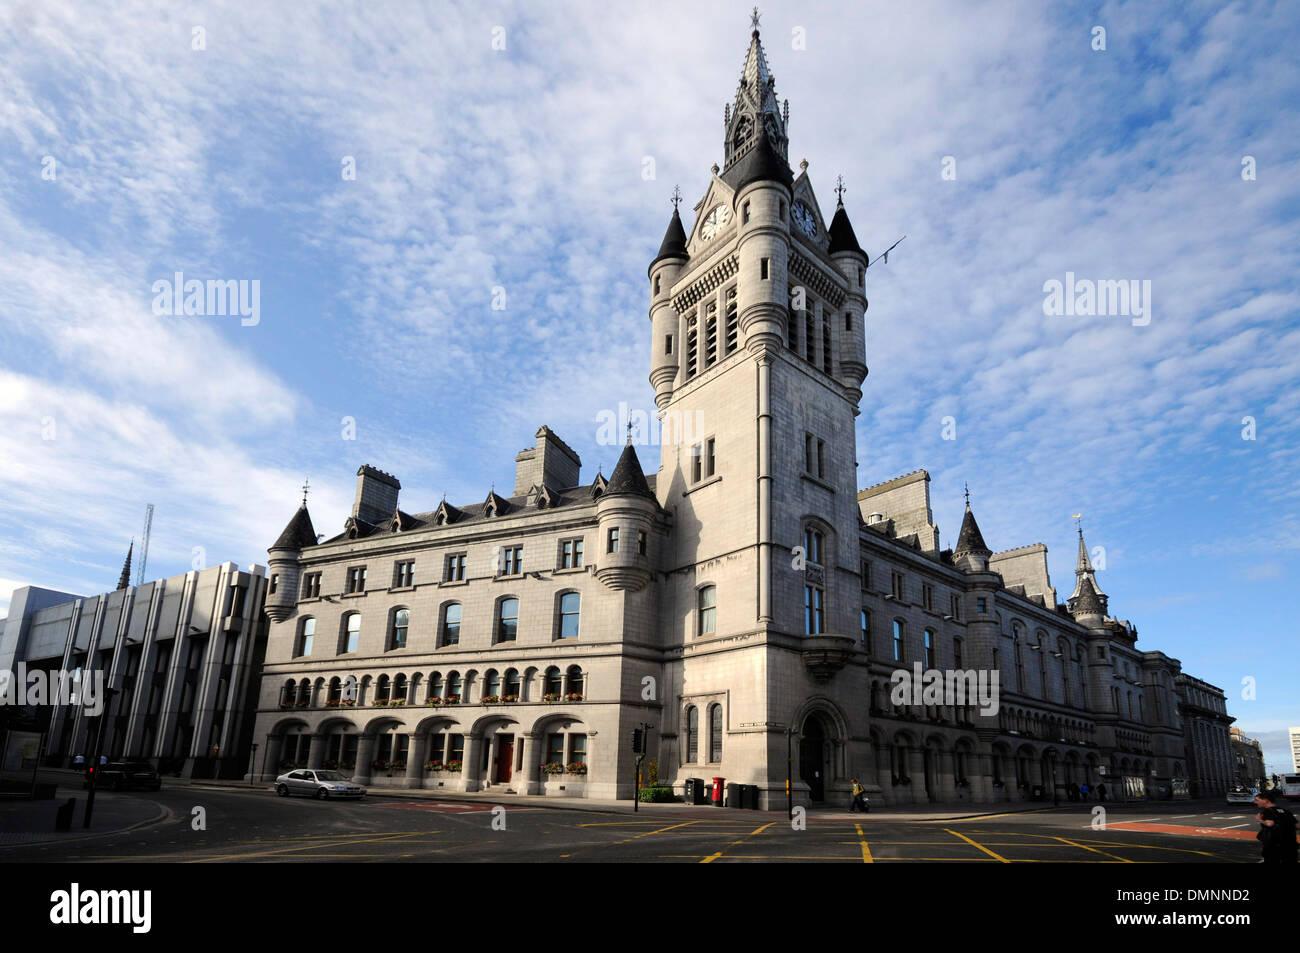 iconic townhouse union street aberdeen - Stock Image